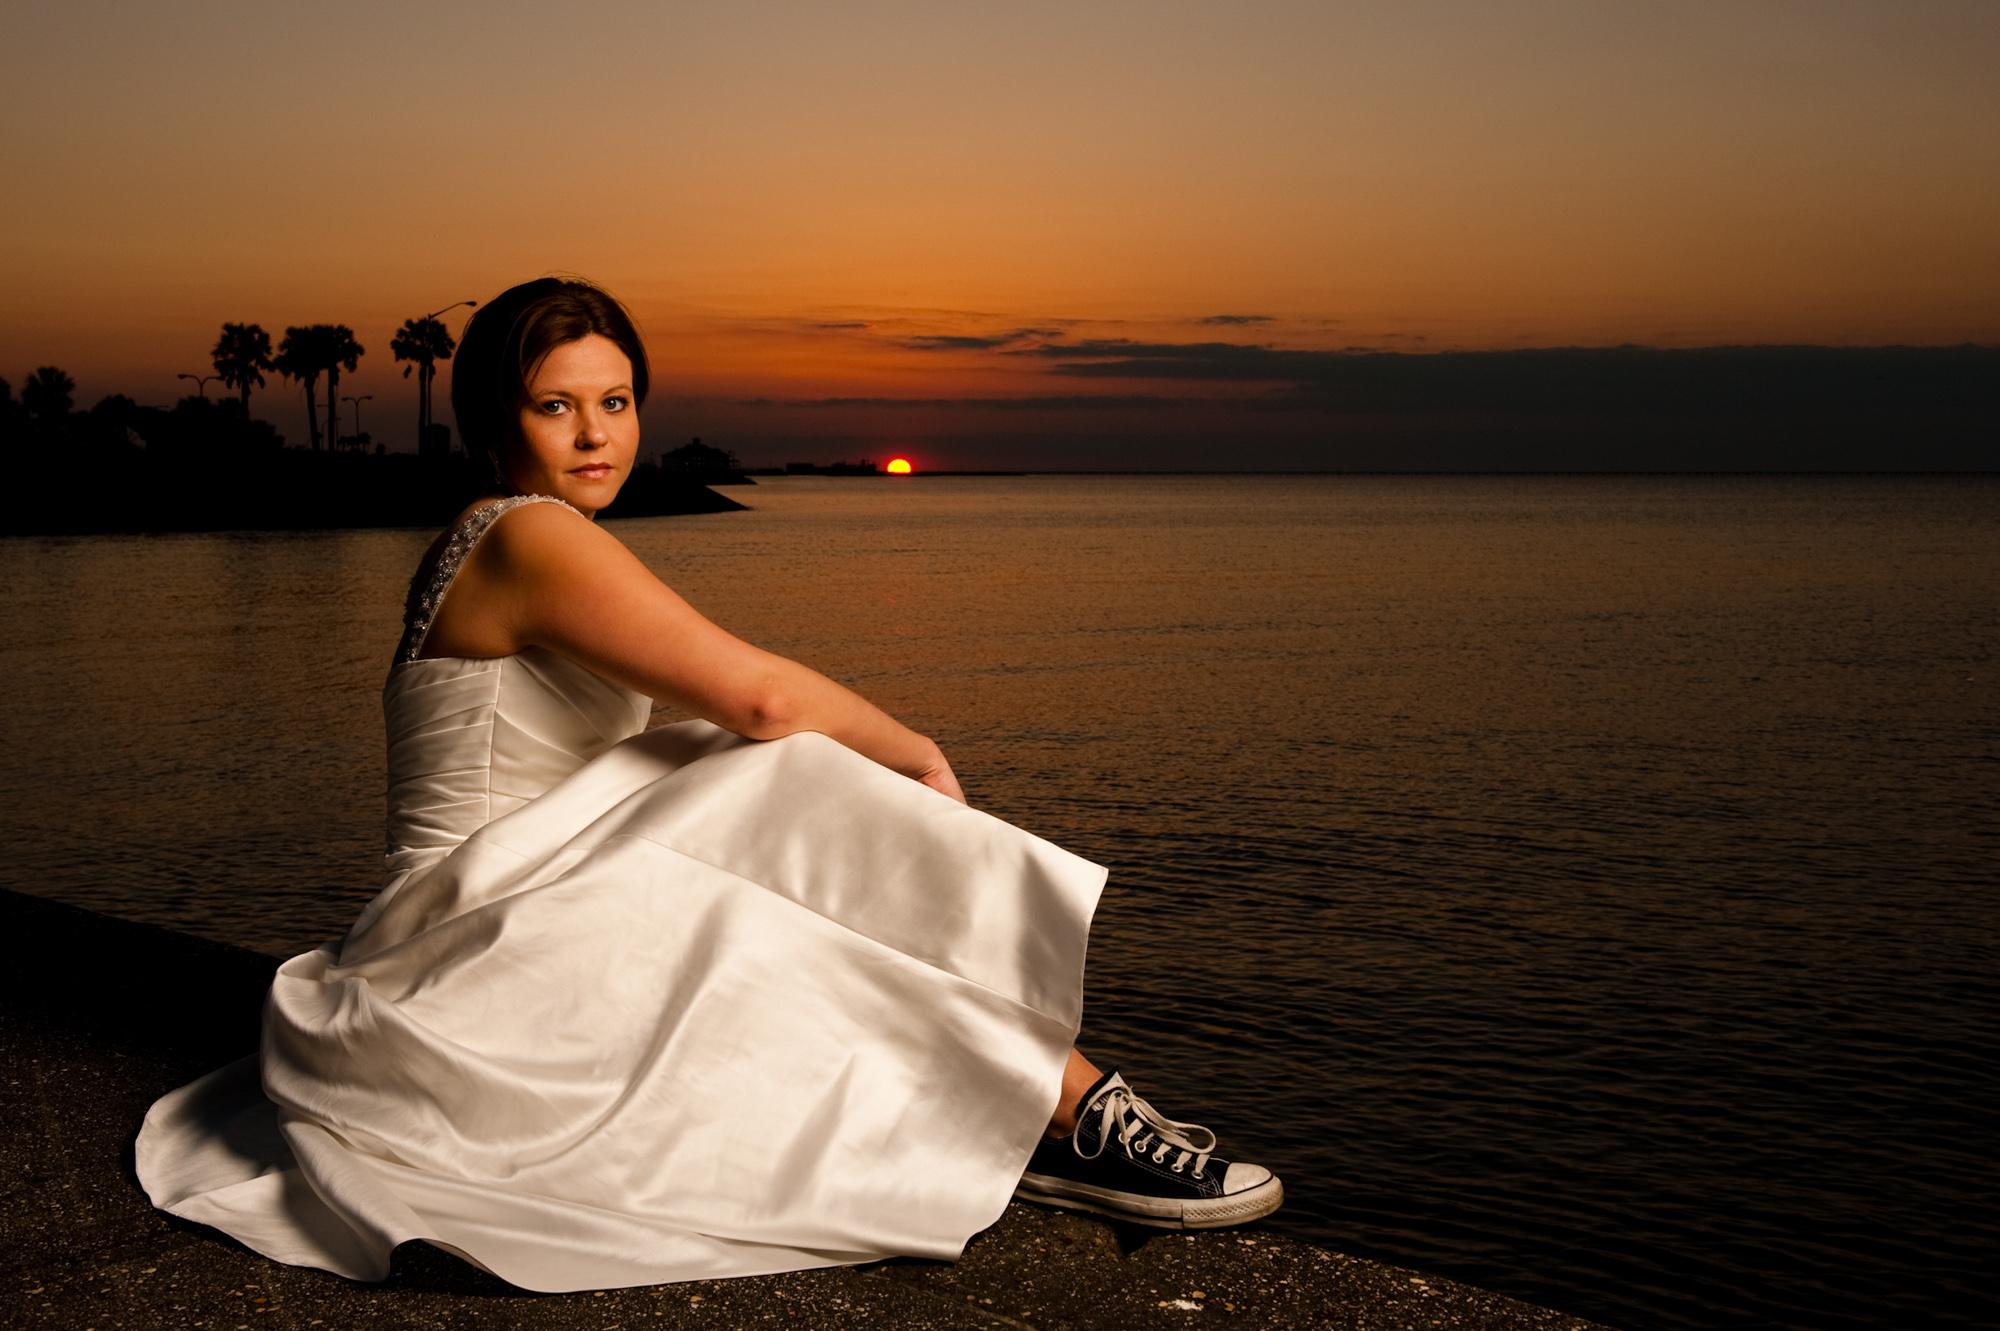 Scott-Myers-Photography-WeddingScott-Myers-Photography-Wedding_SAM7964.jpg